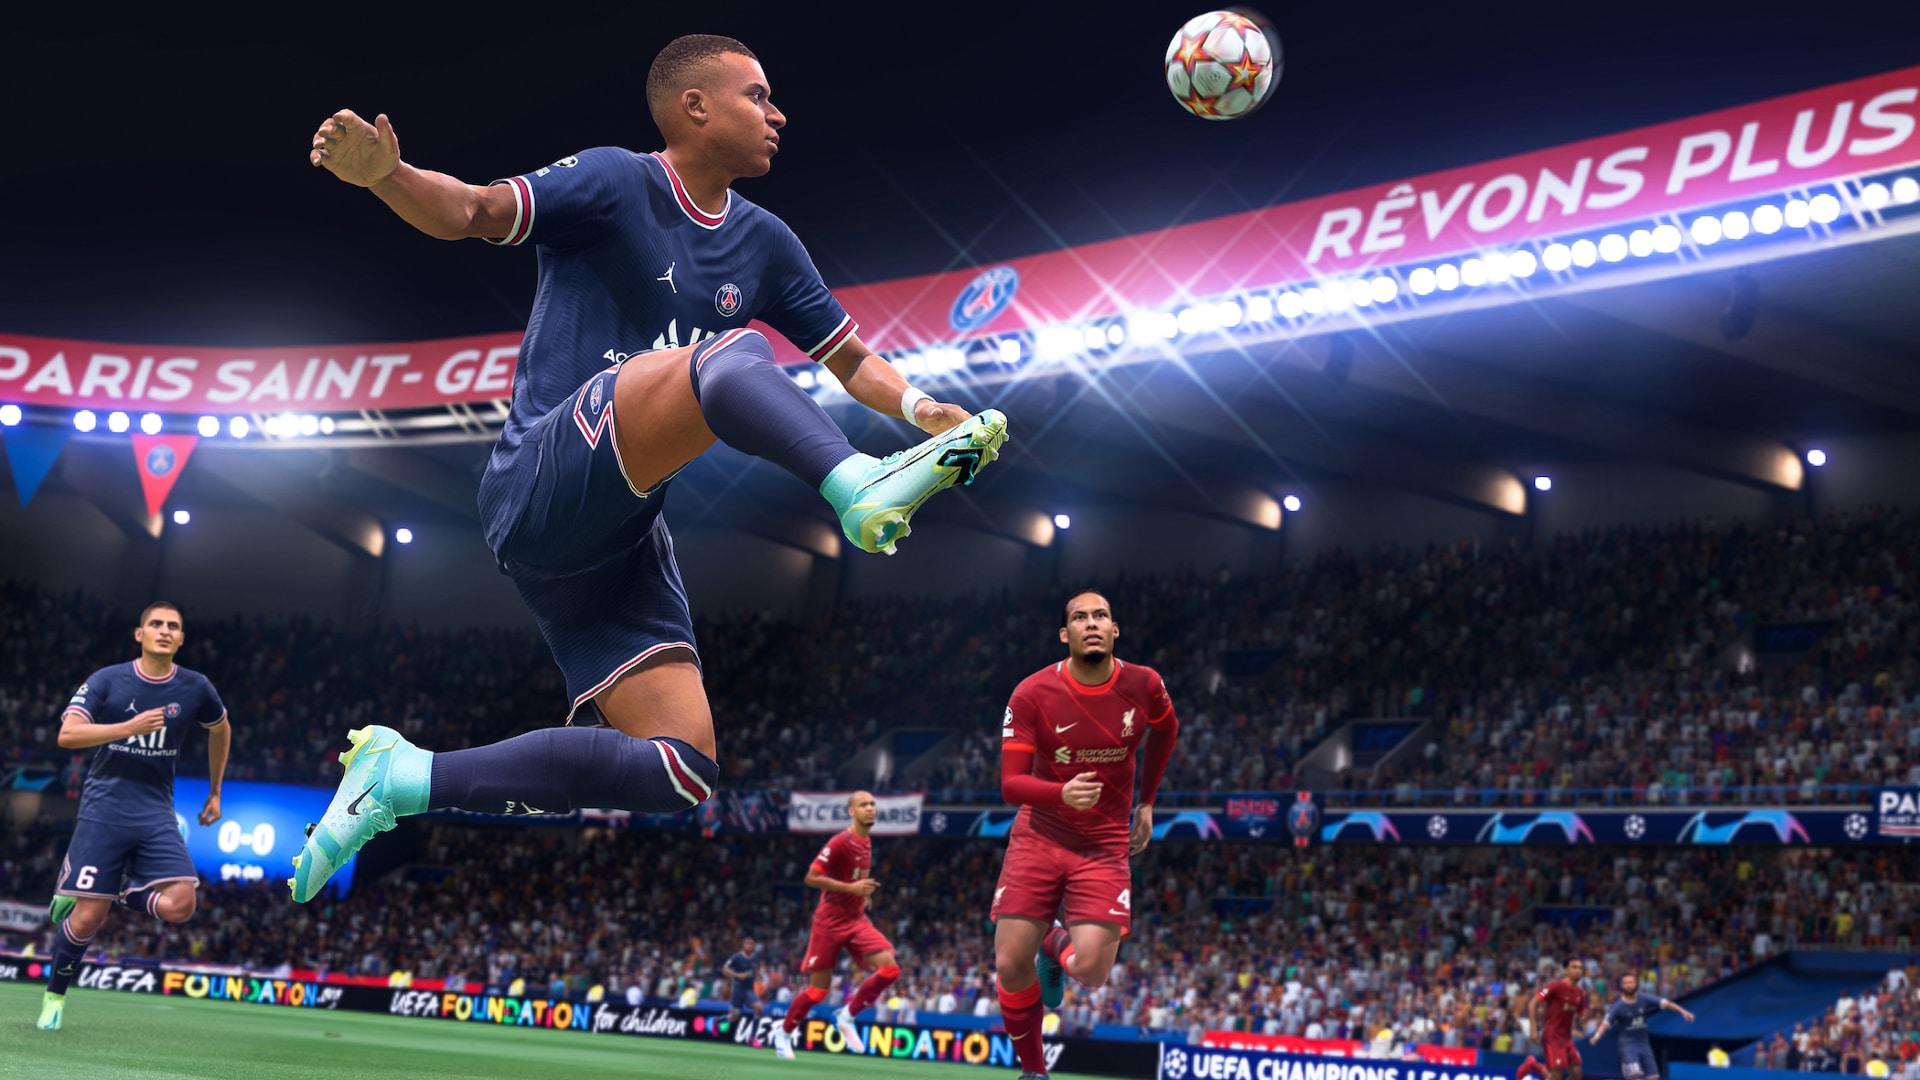 WATCH: 'FIFA 22' Trailer Guarantees The Most Hyper-Lifelike Model But